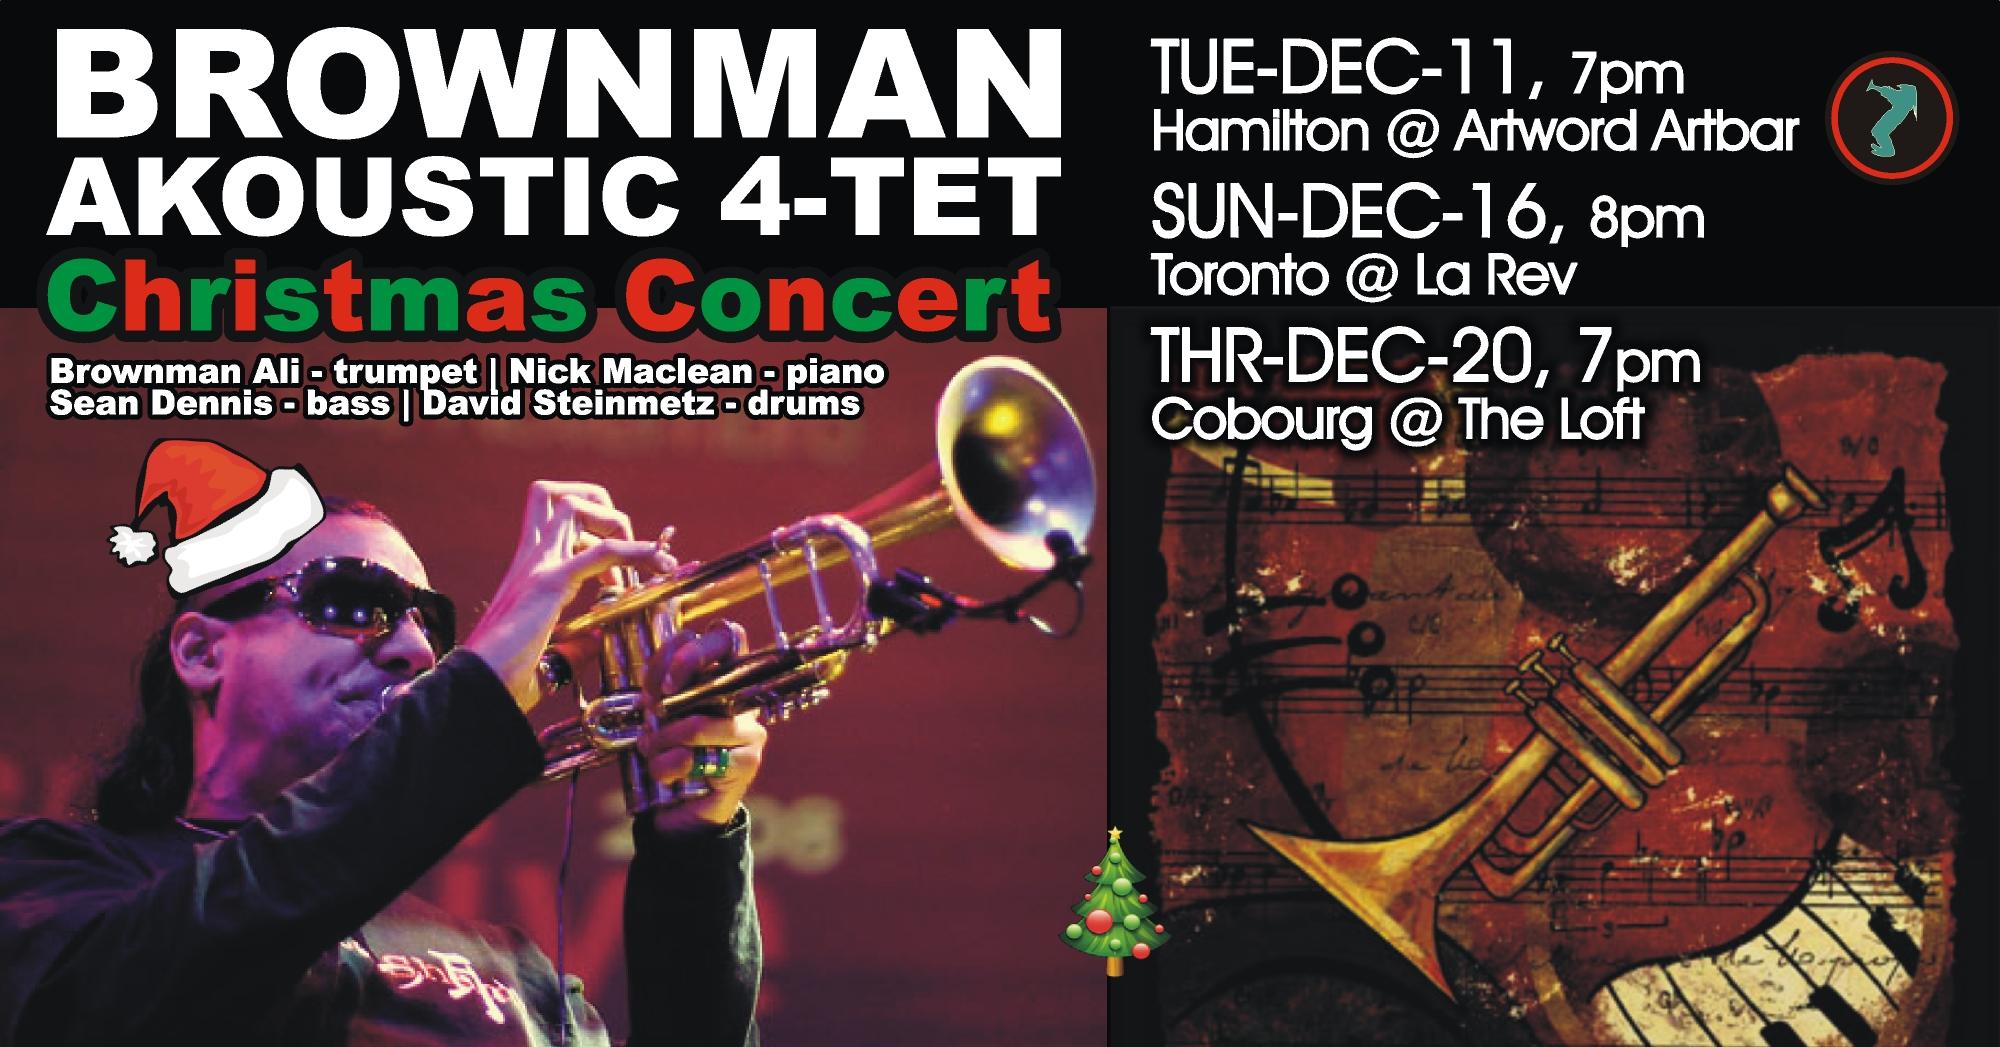 Brownman Akoustic Quartet -- A Jazz Christmas Concert